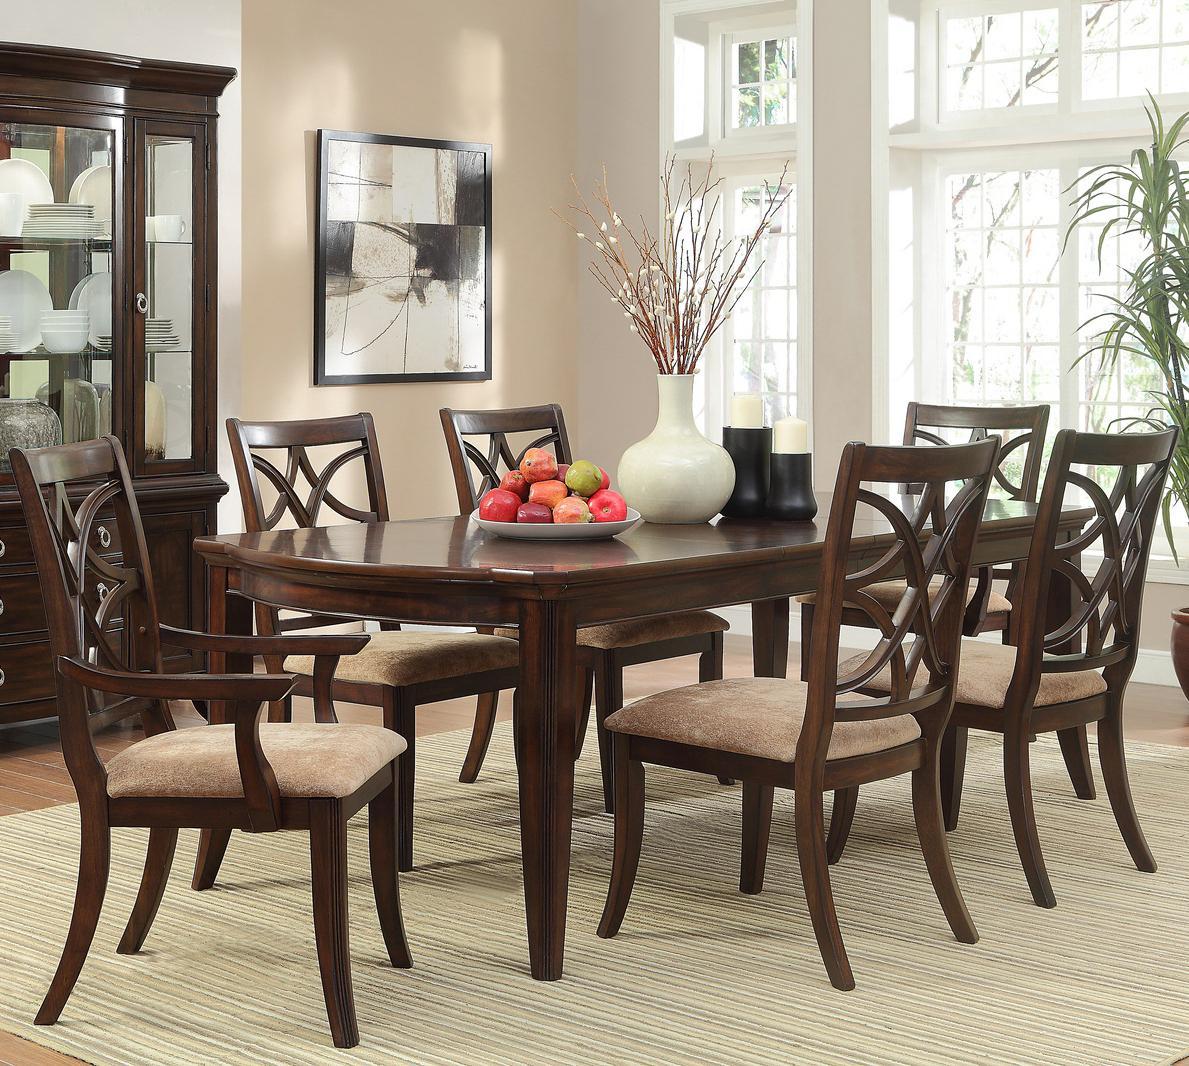 Homelegance keegan 7 piece dining set with rectangular for Hudsons furniture